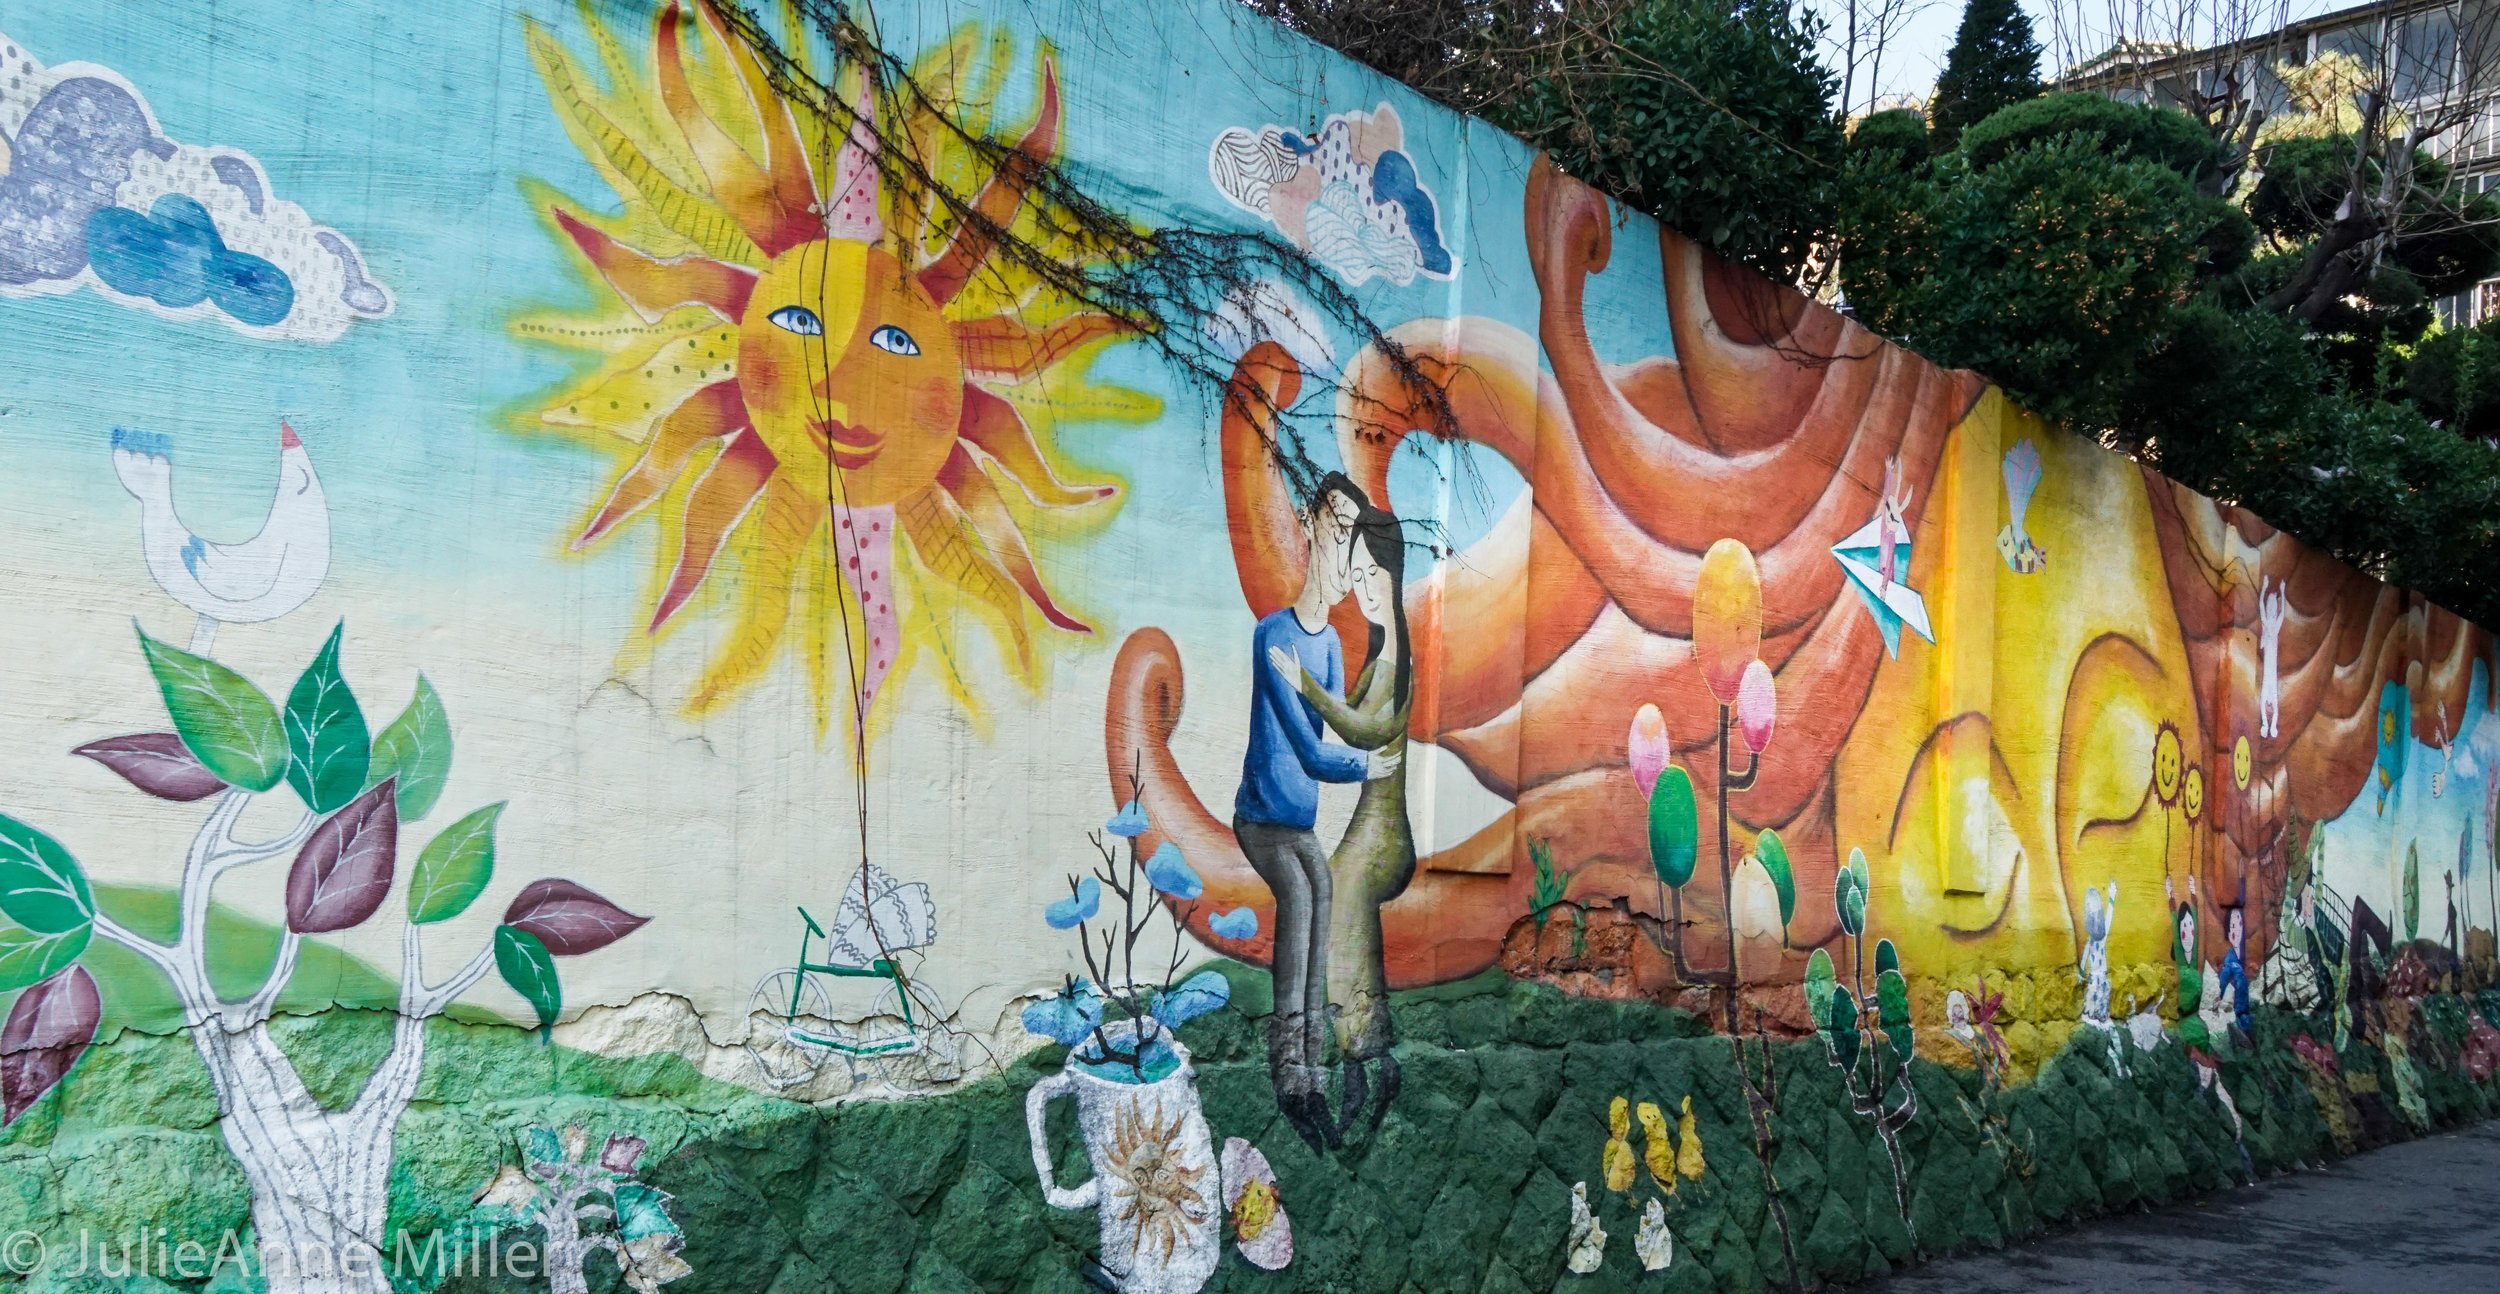 Local street art, Ihwa Mural Village, Seoul